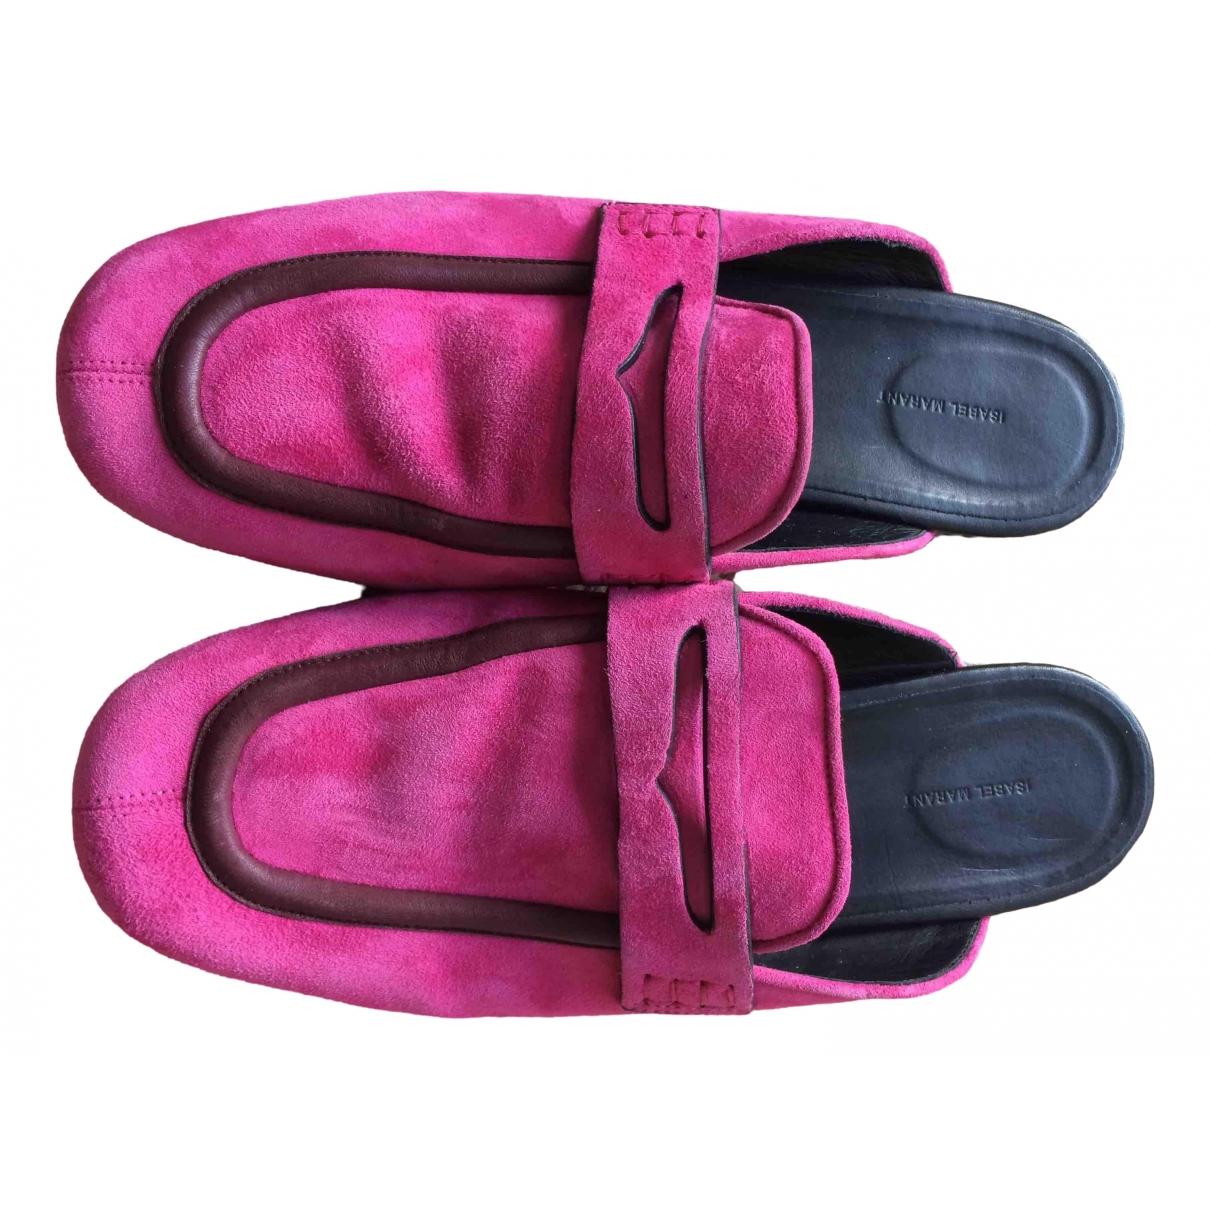 Isabel Marant Follan Pink Leather Sandals for Women 41 EU